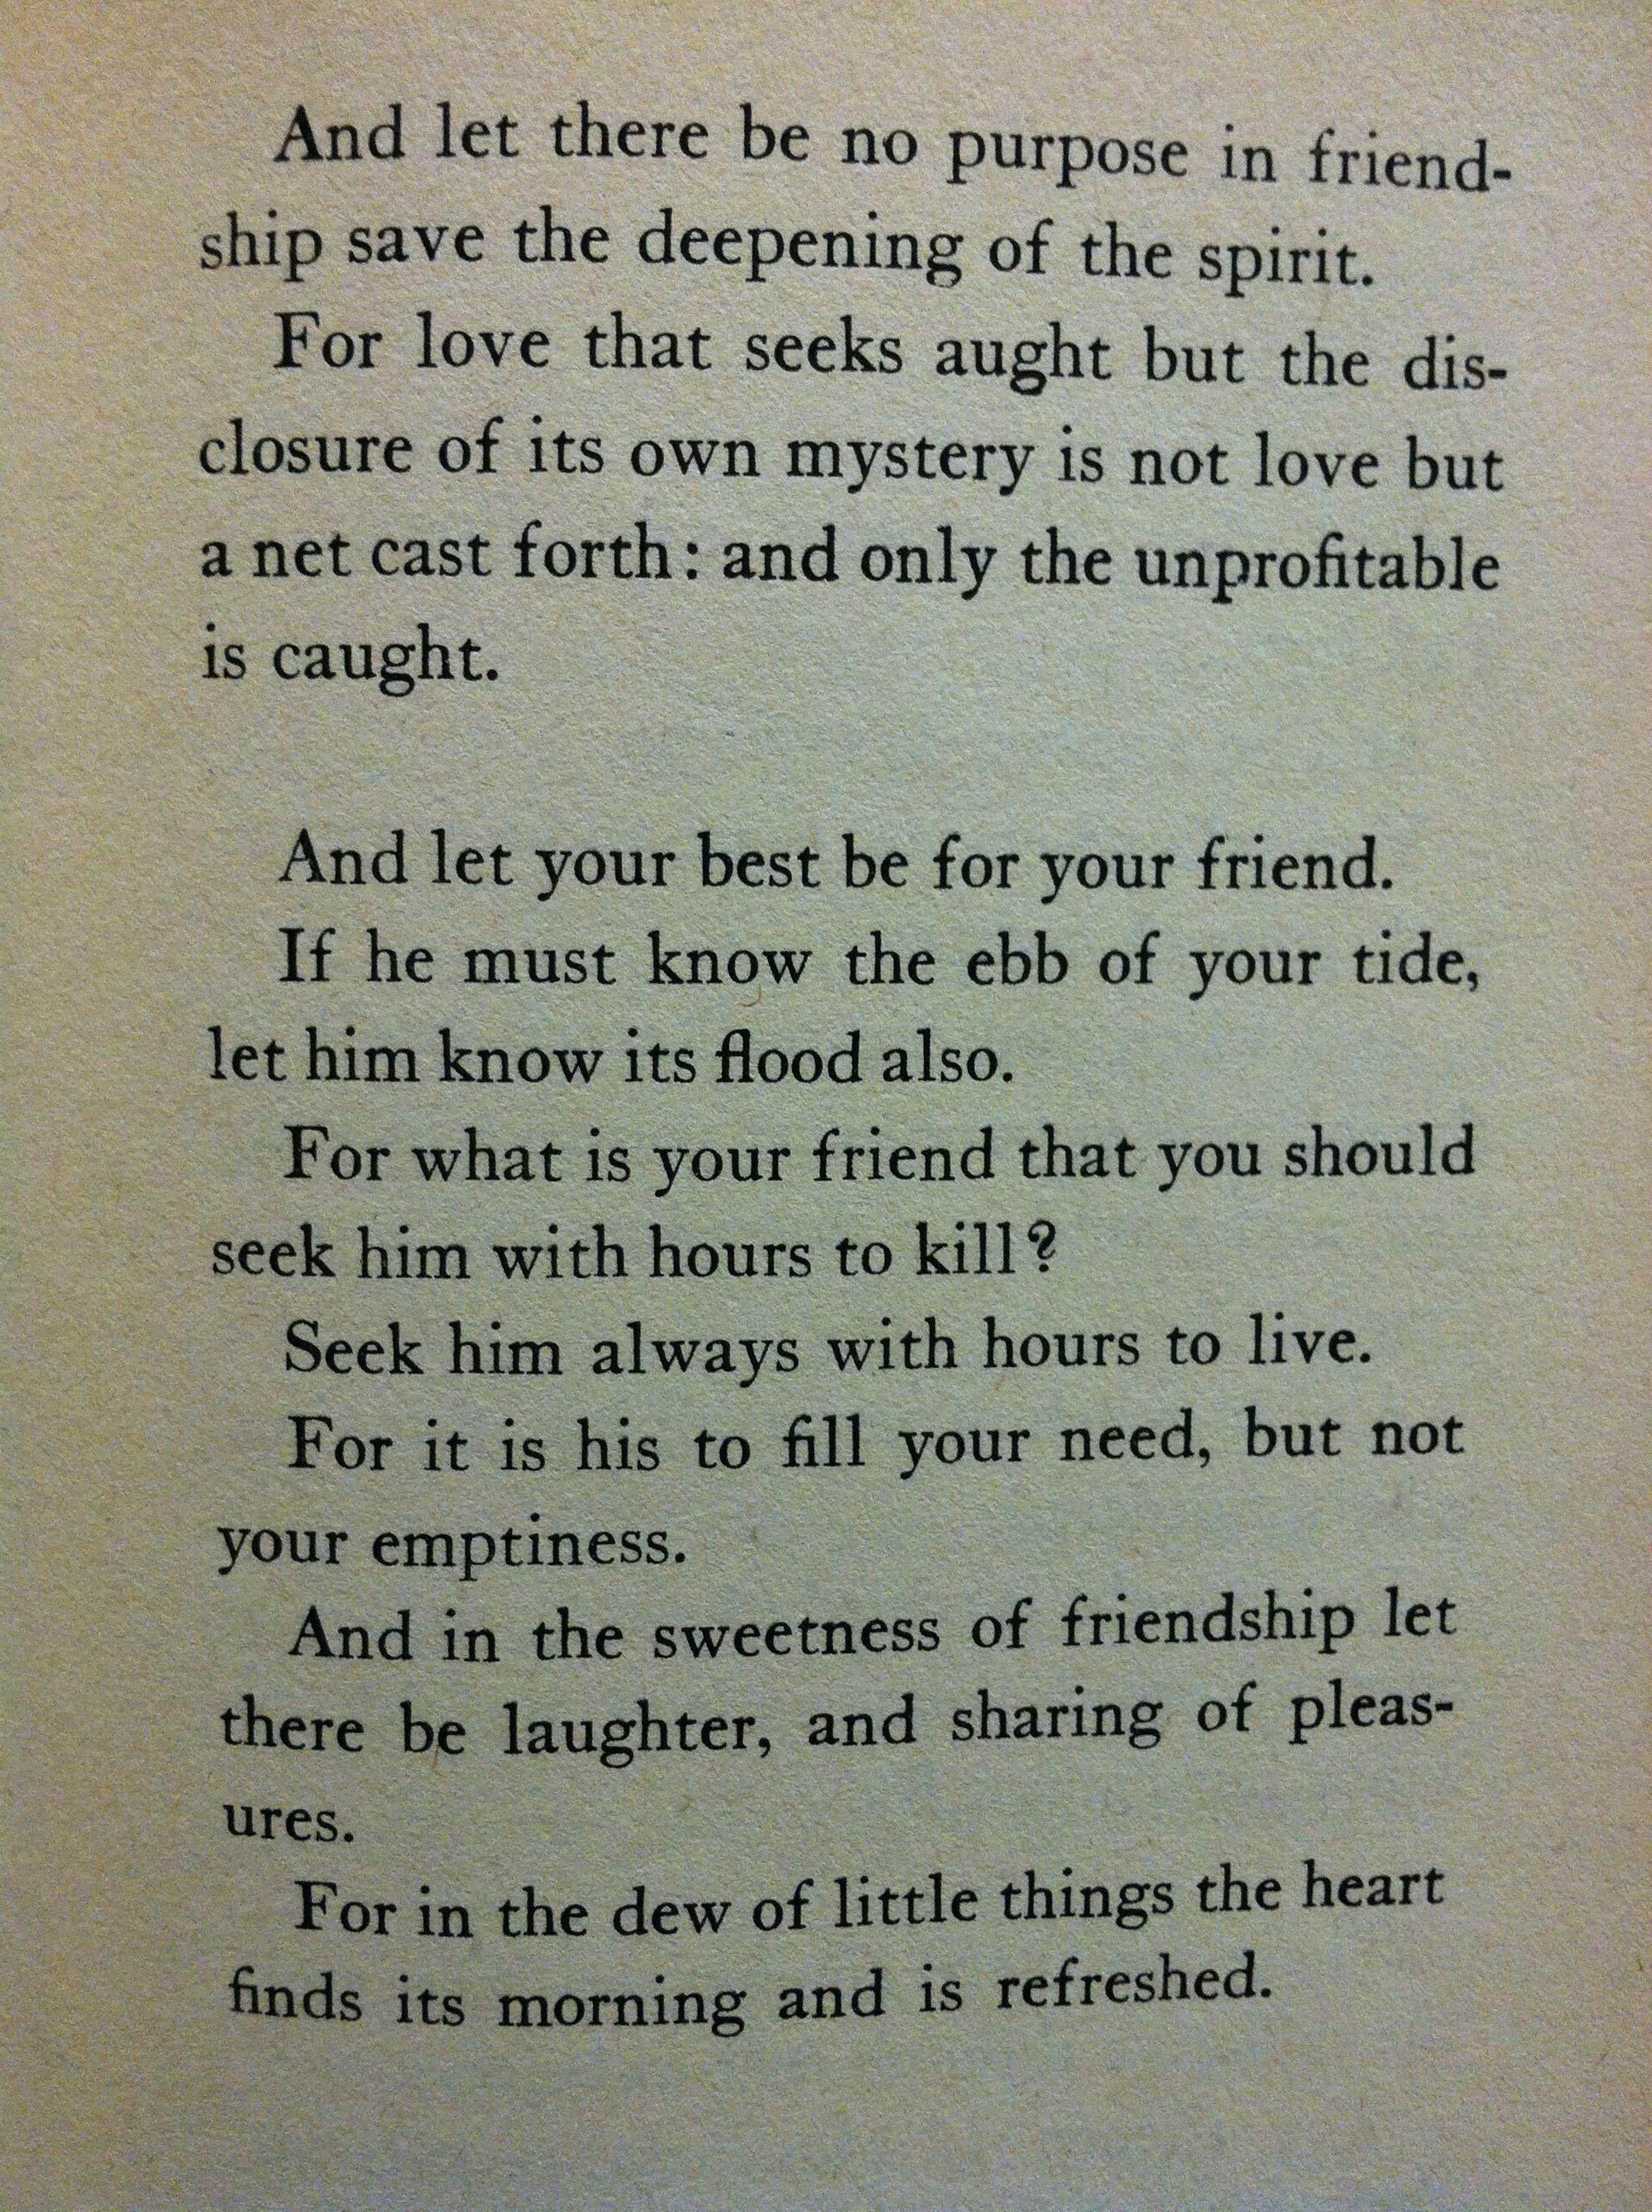 On Friendship The Prophet Kahlil Gibran Prophet Quotes